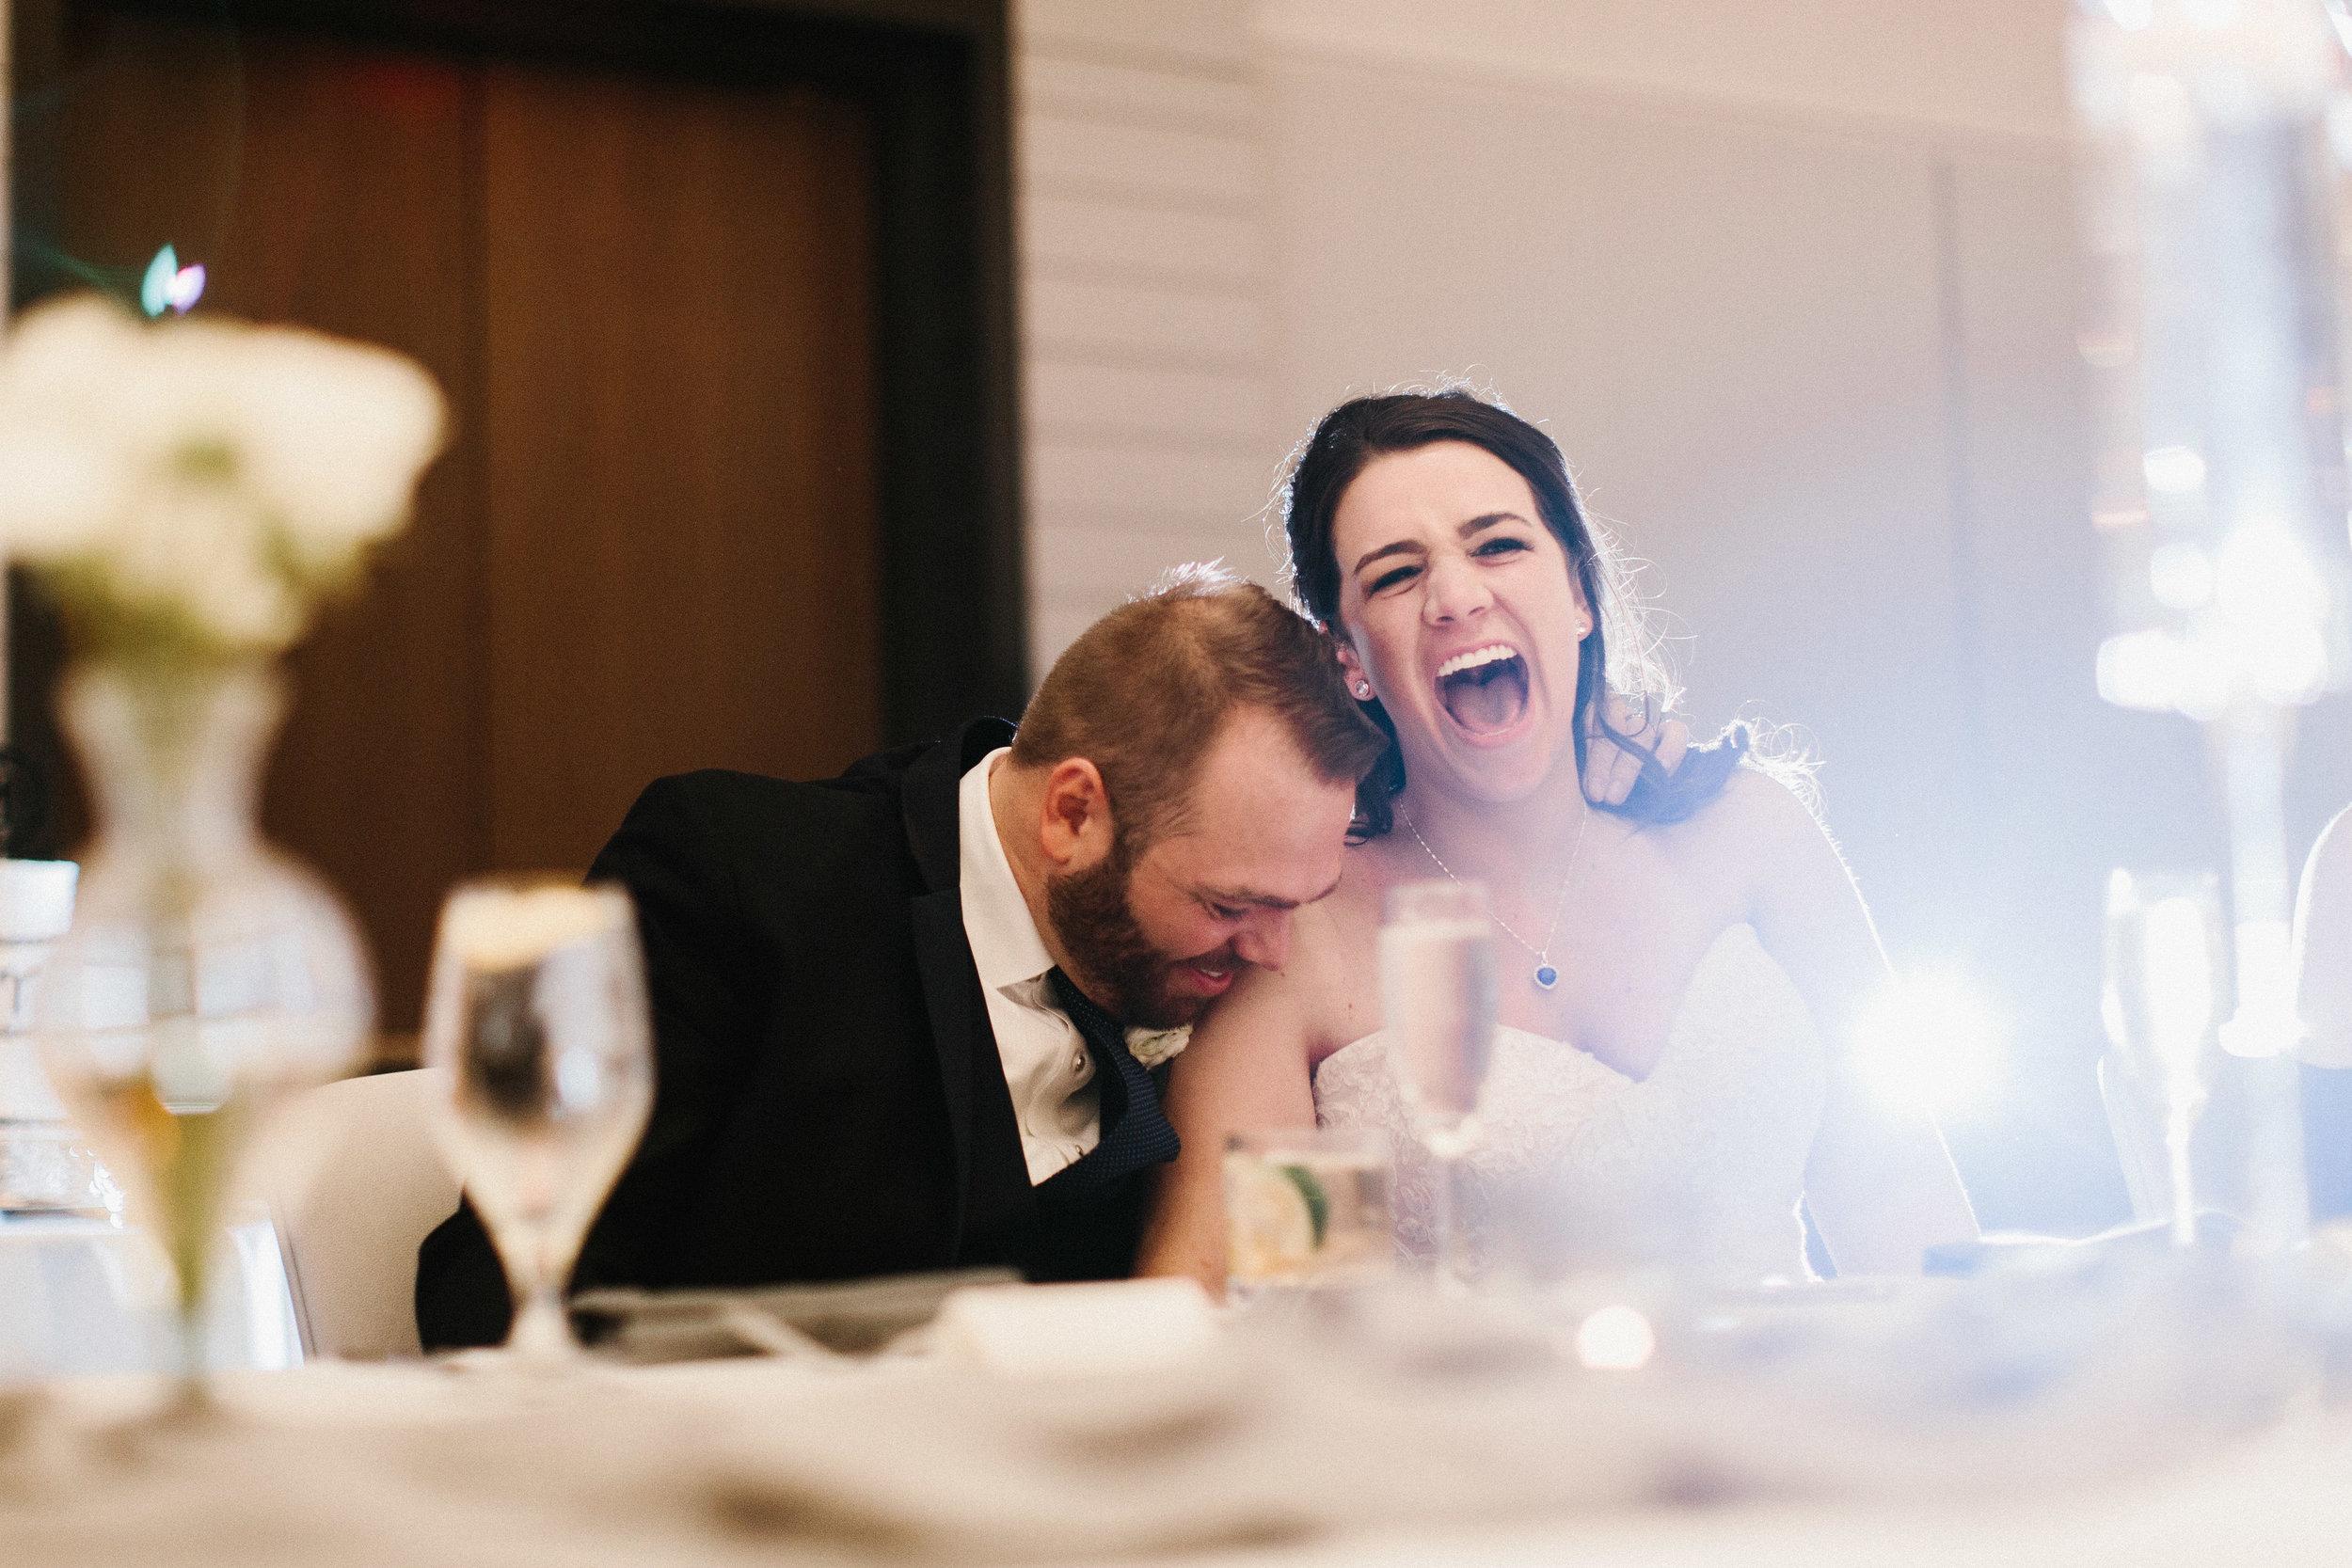 roswell_st_peter_chanel_catholic_avalon_hotel_alpharetta_wedding-2068.jpg